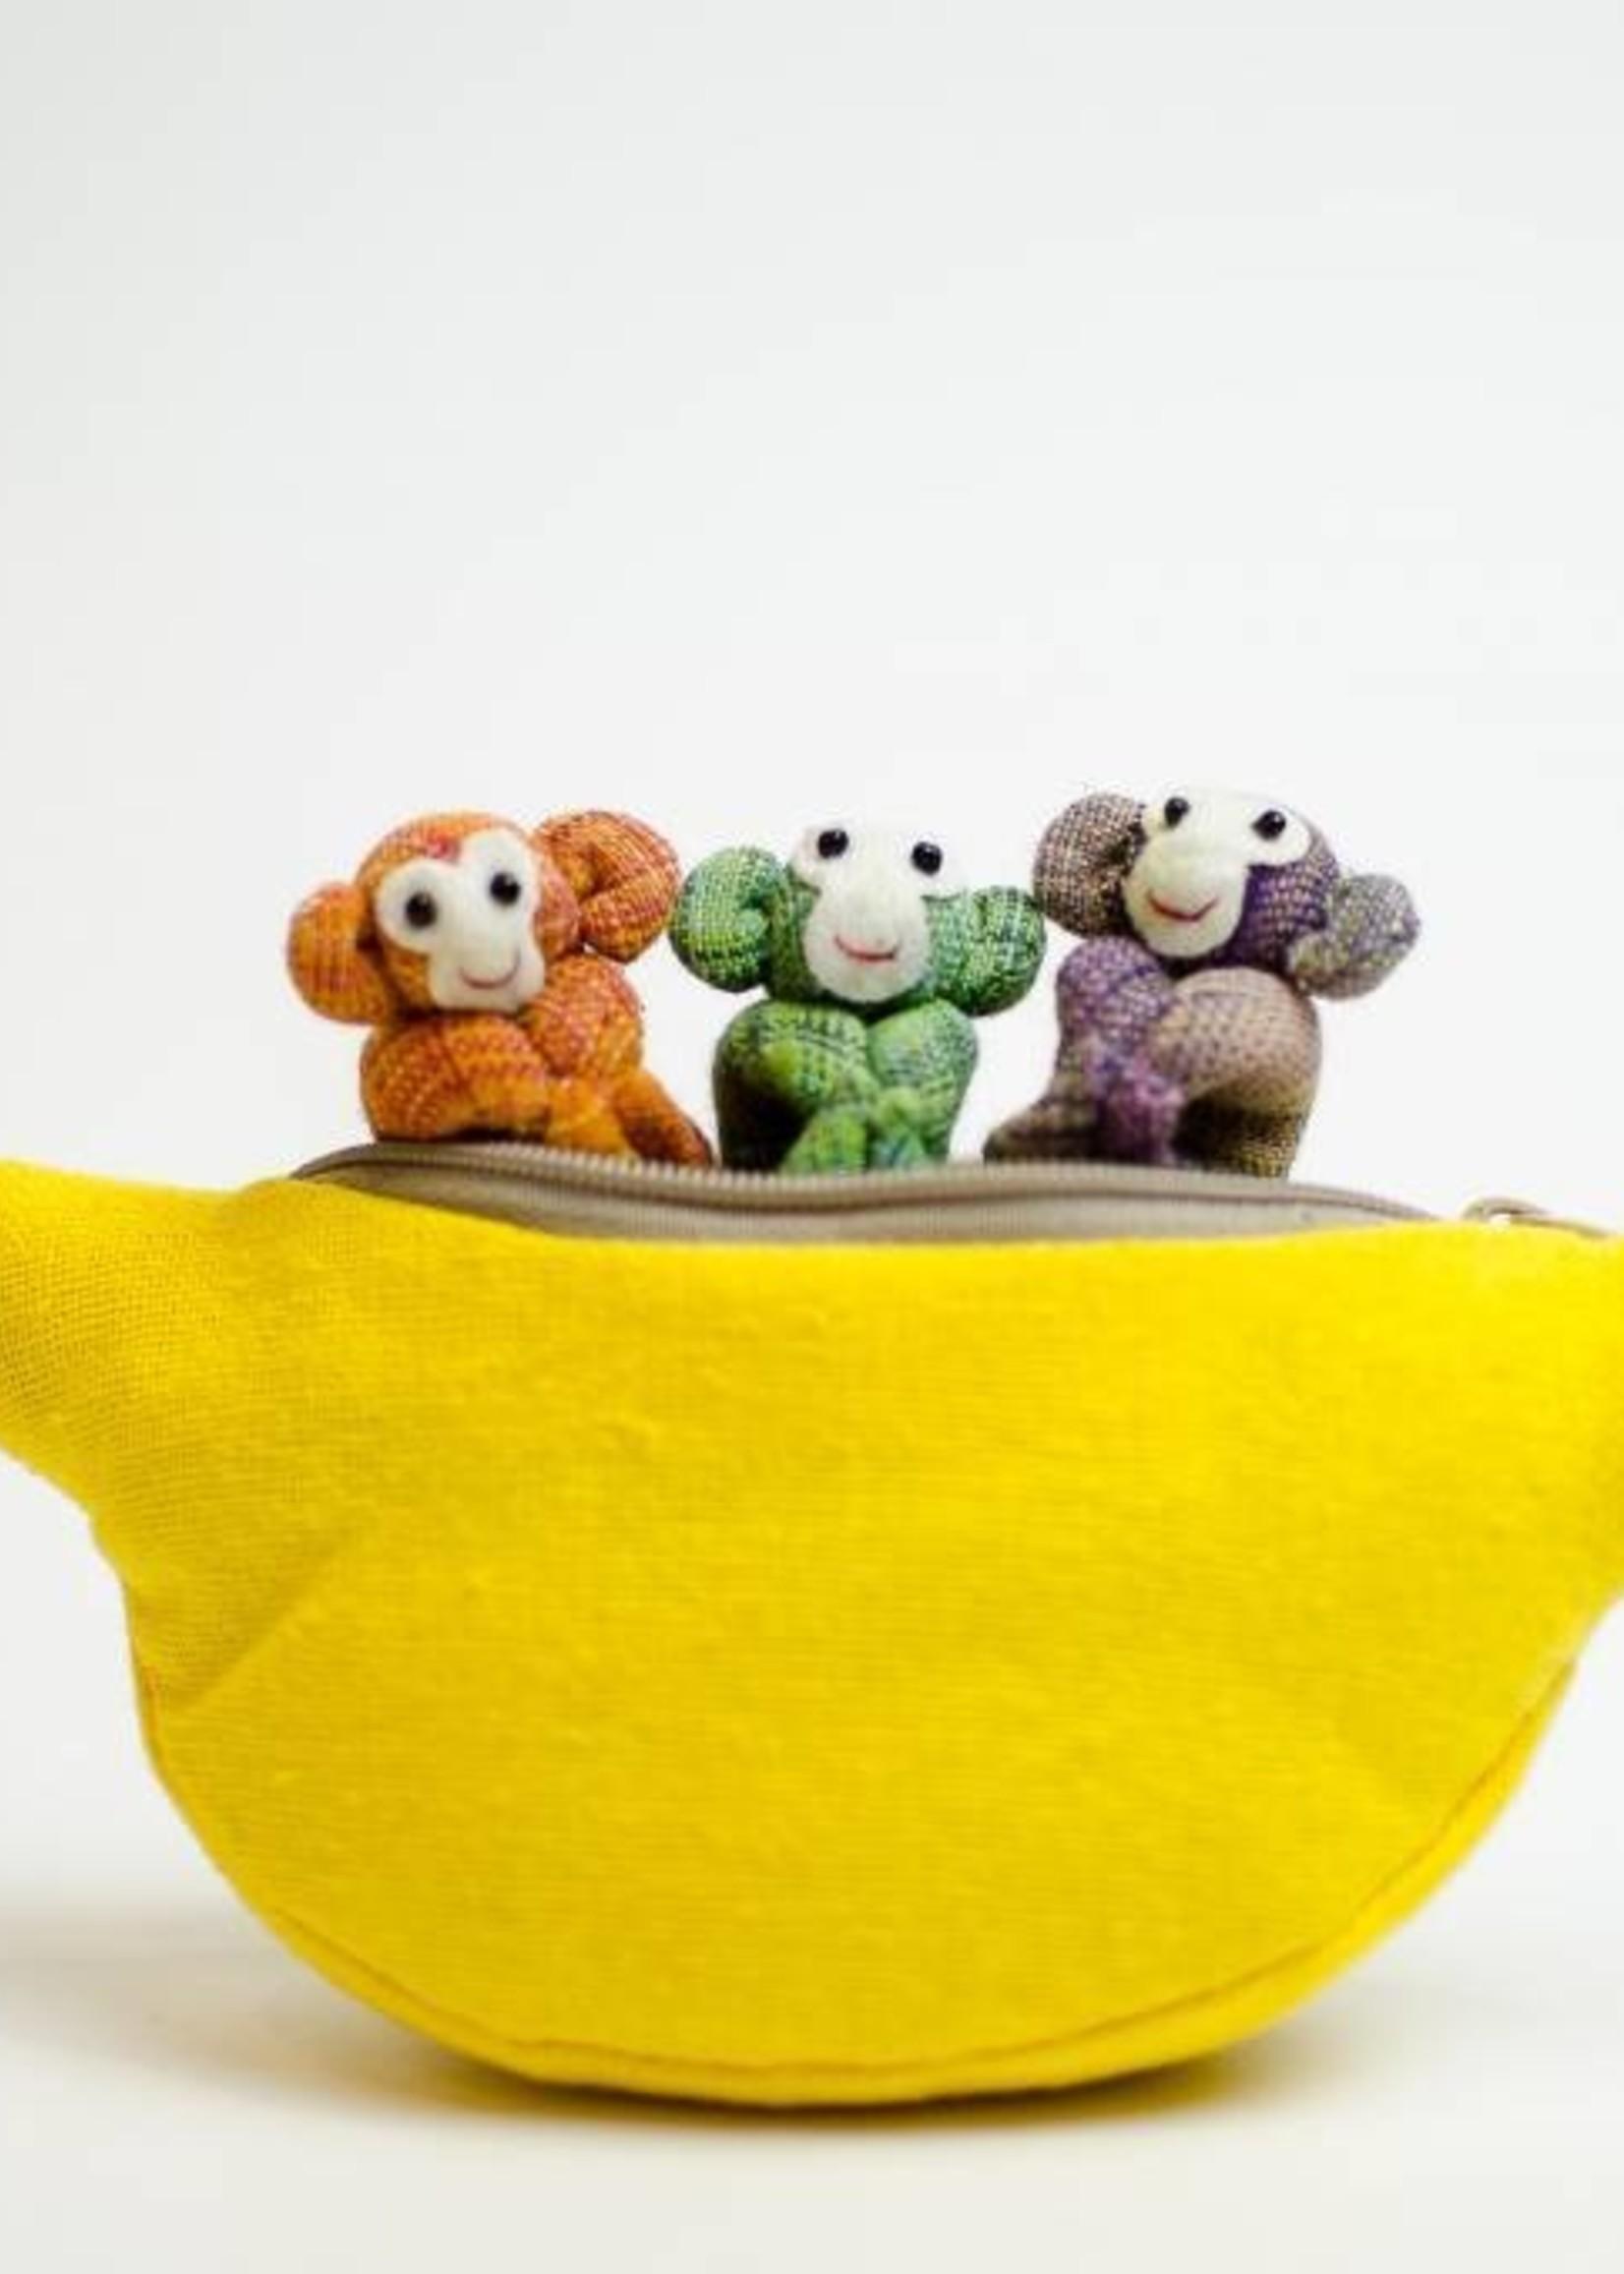 Migration - Monkeys in Banana